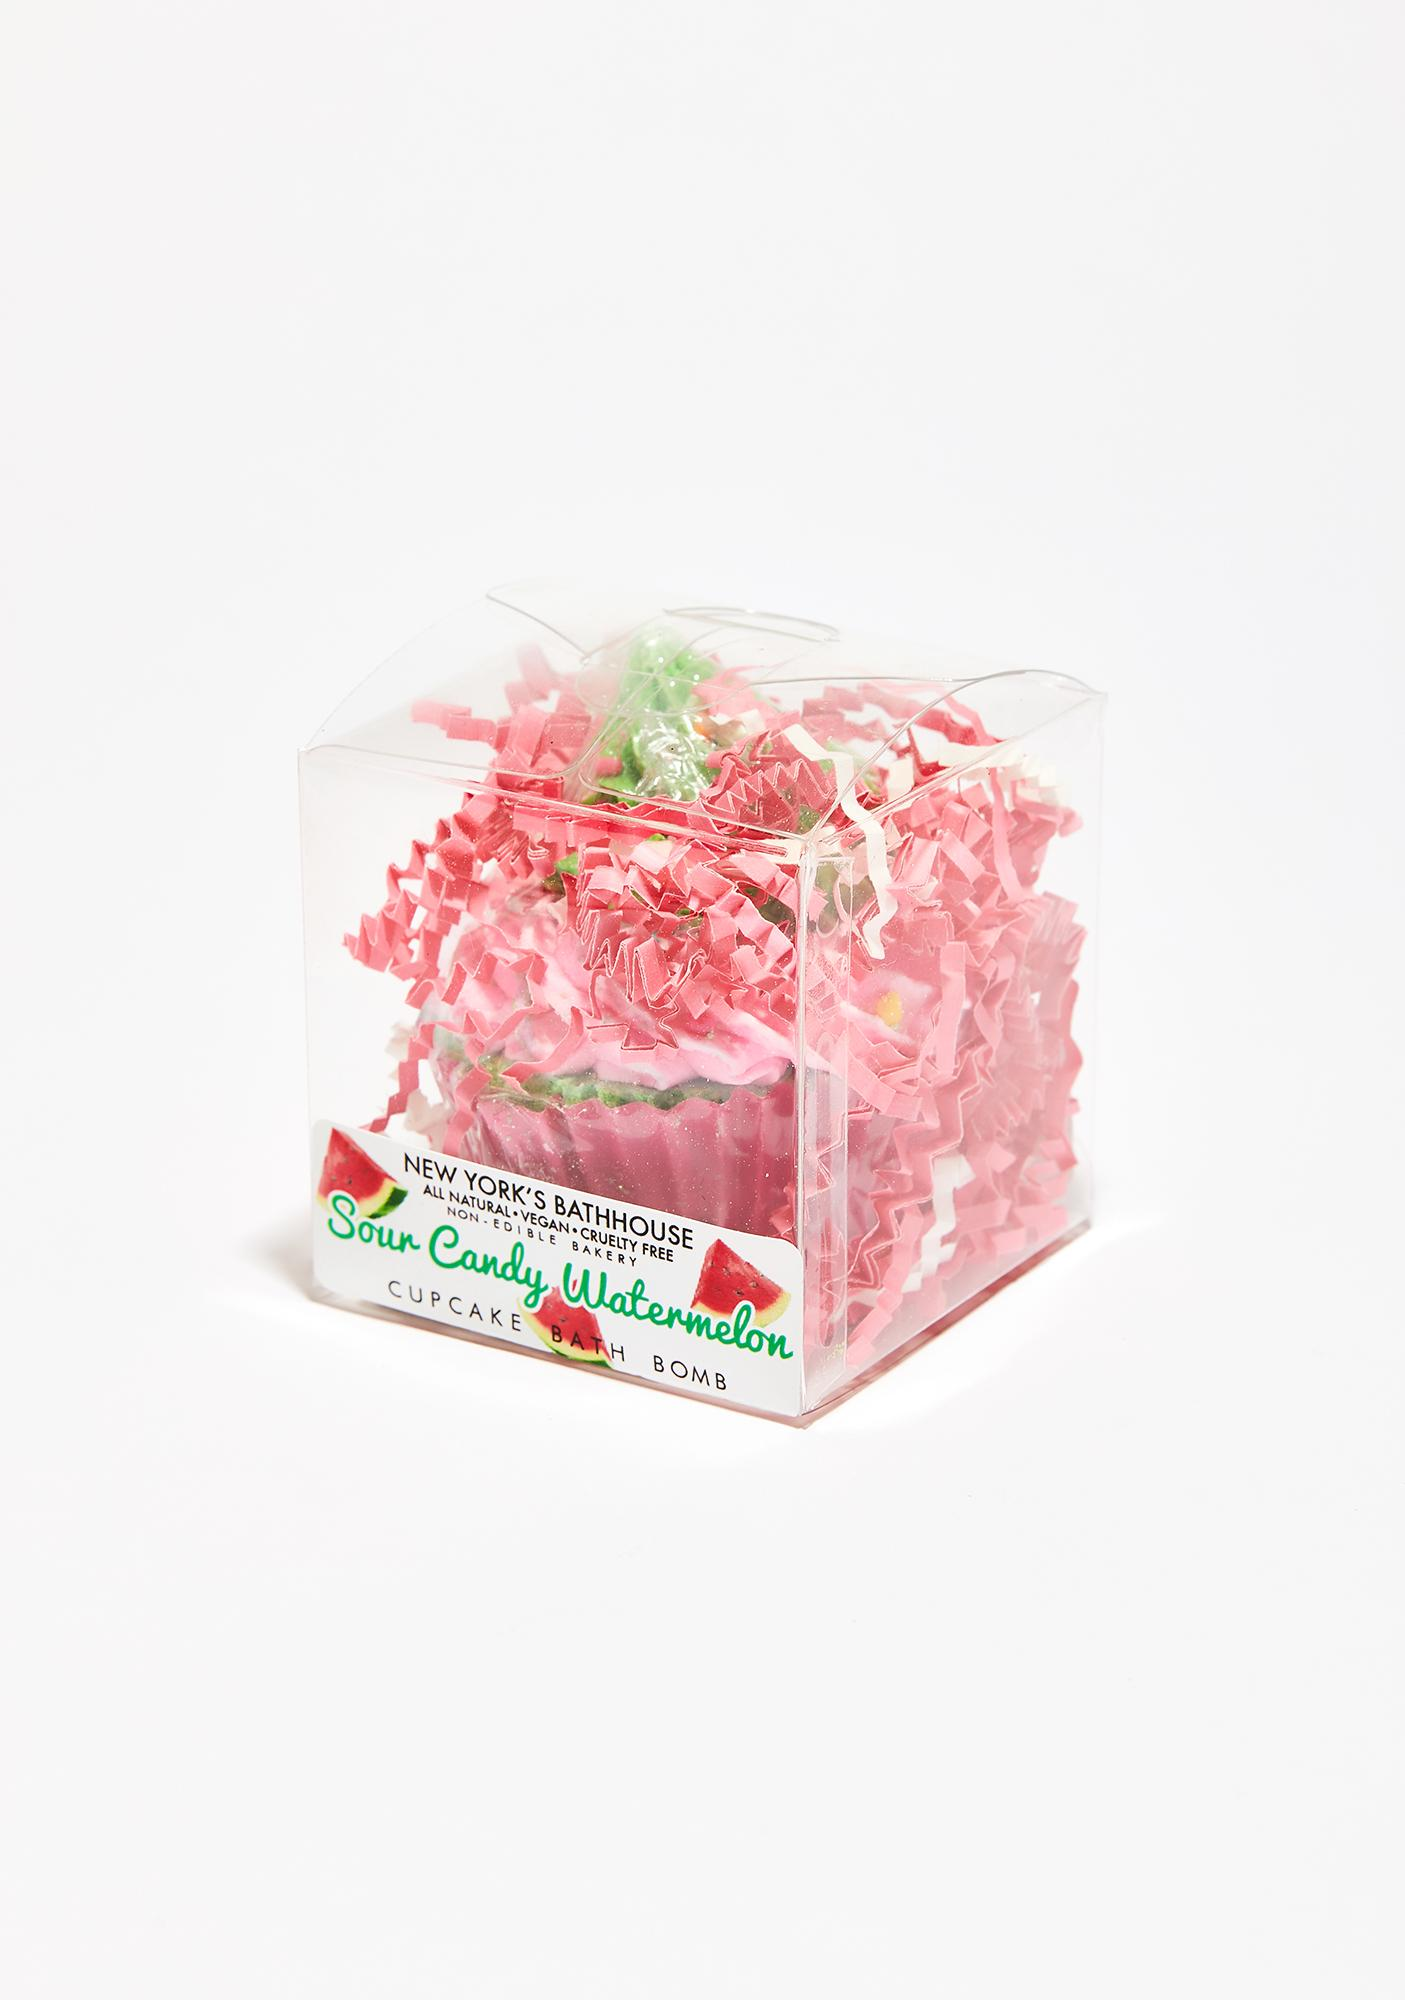 New York's Bathhouse Sour Watermelon Candy Cupcake Bath Bomb